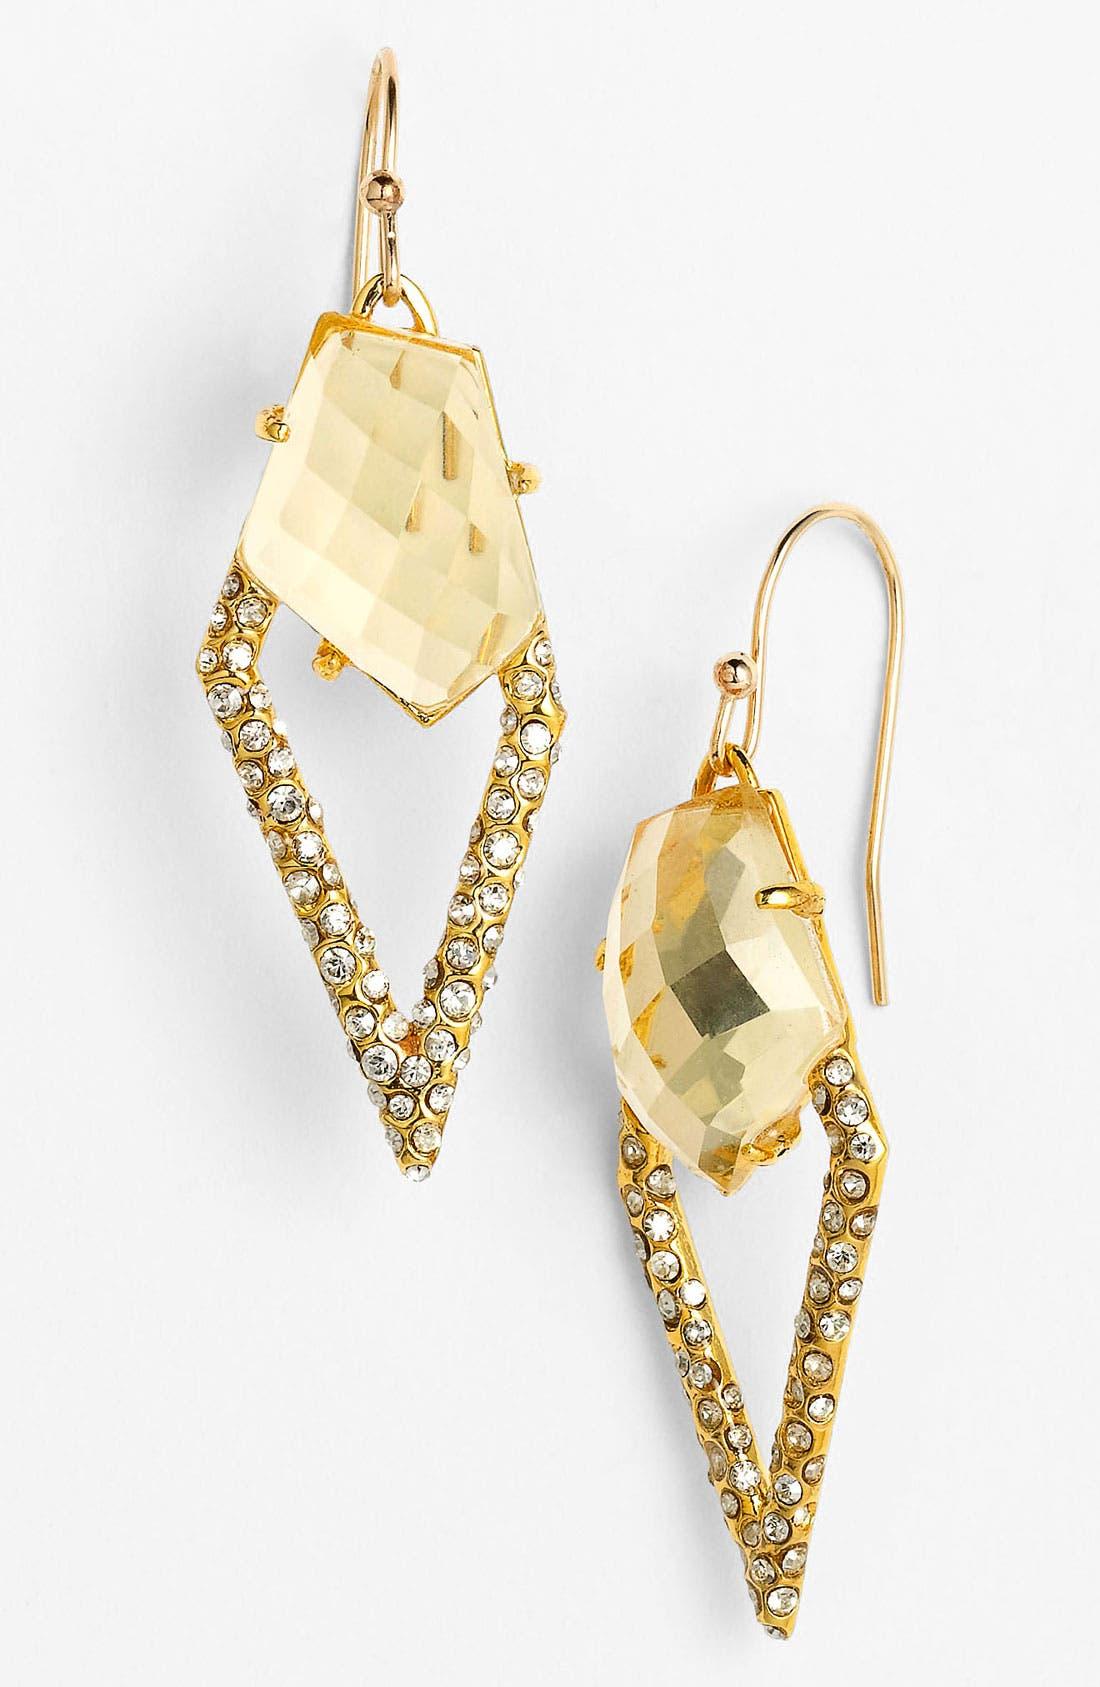 Alternate Image 1 Selected - Alexis Bittar 'Miss Havisham - New Wave' Kite Earrings